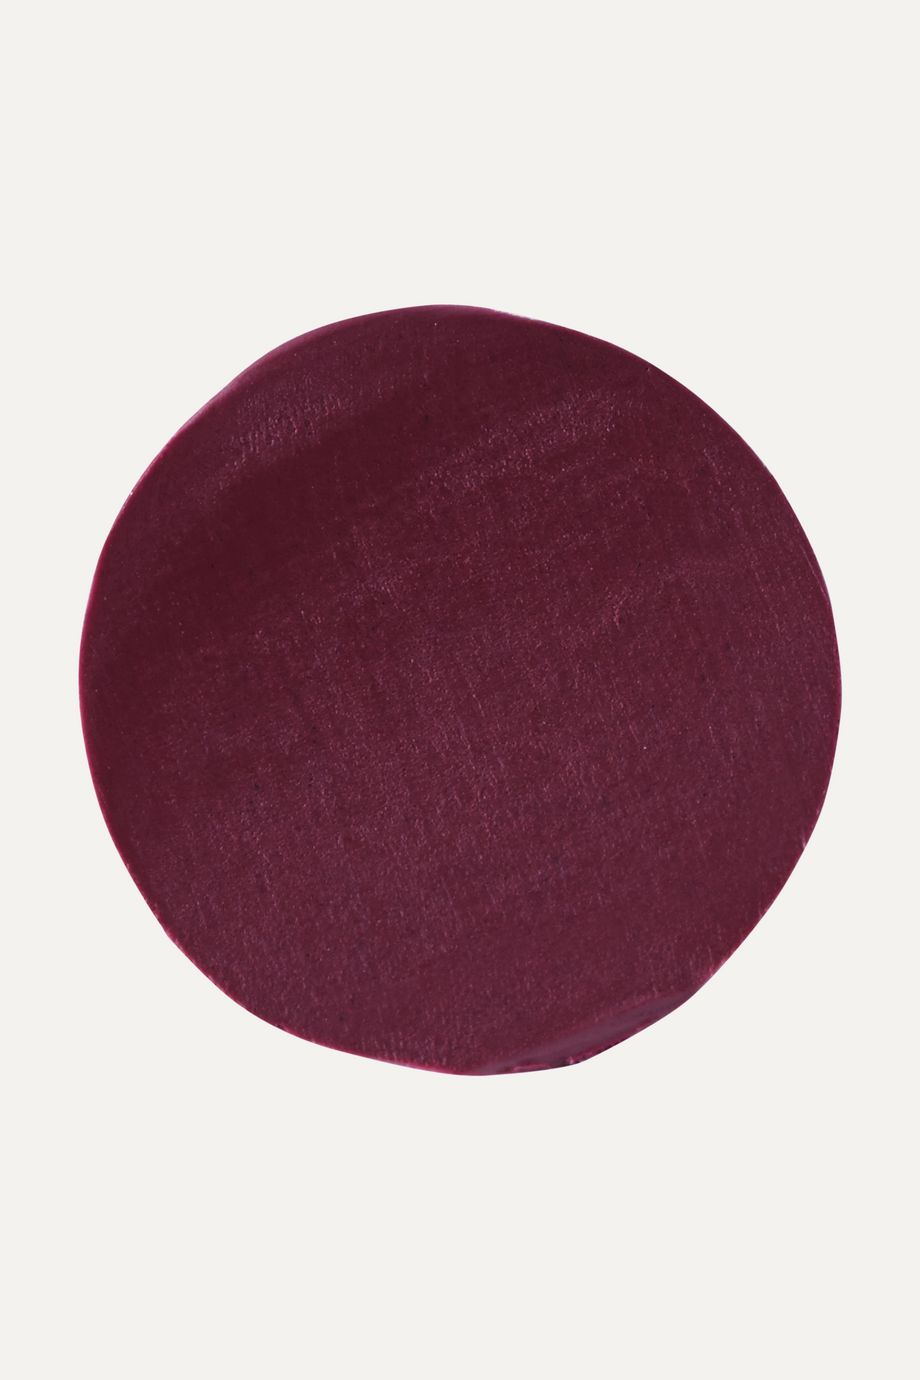 Illamasqua 唇膏(色号:Shard)